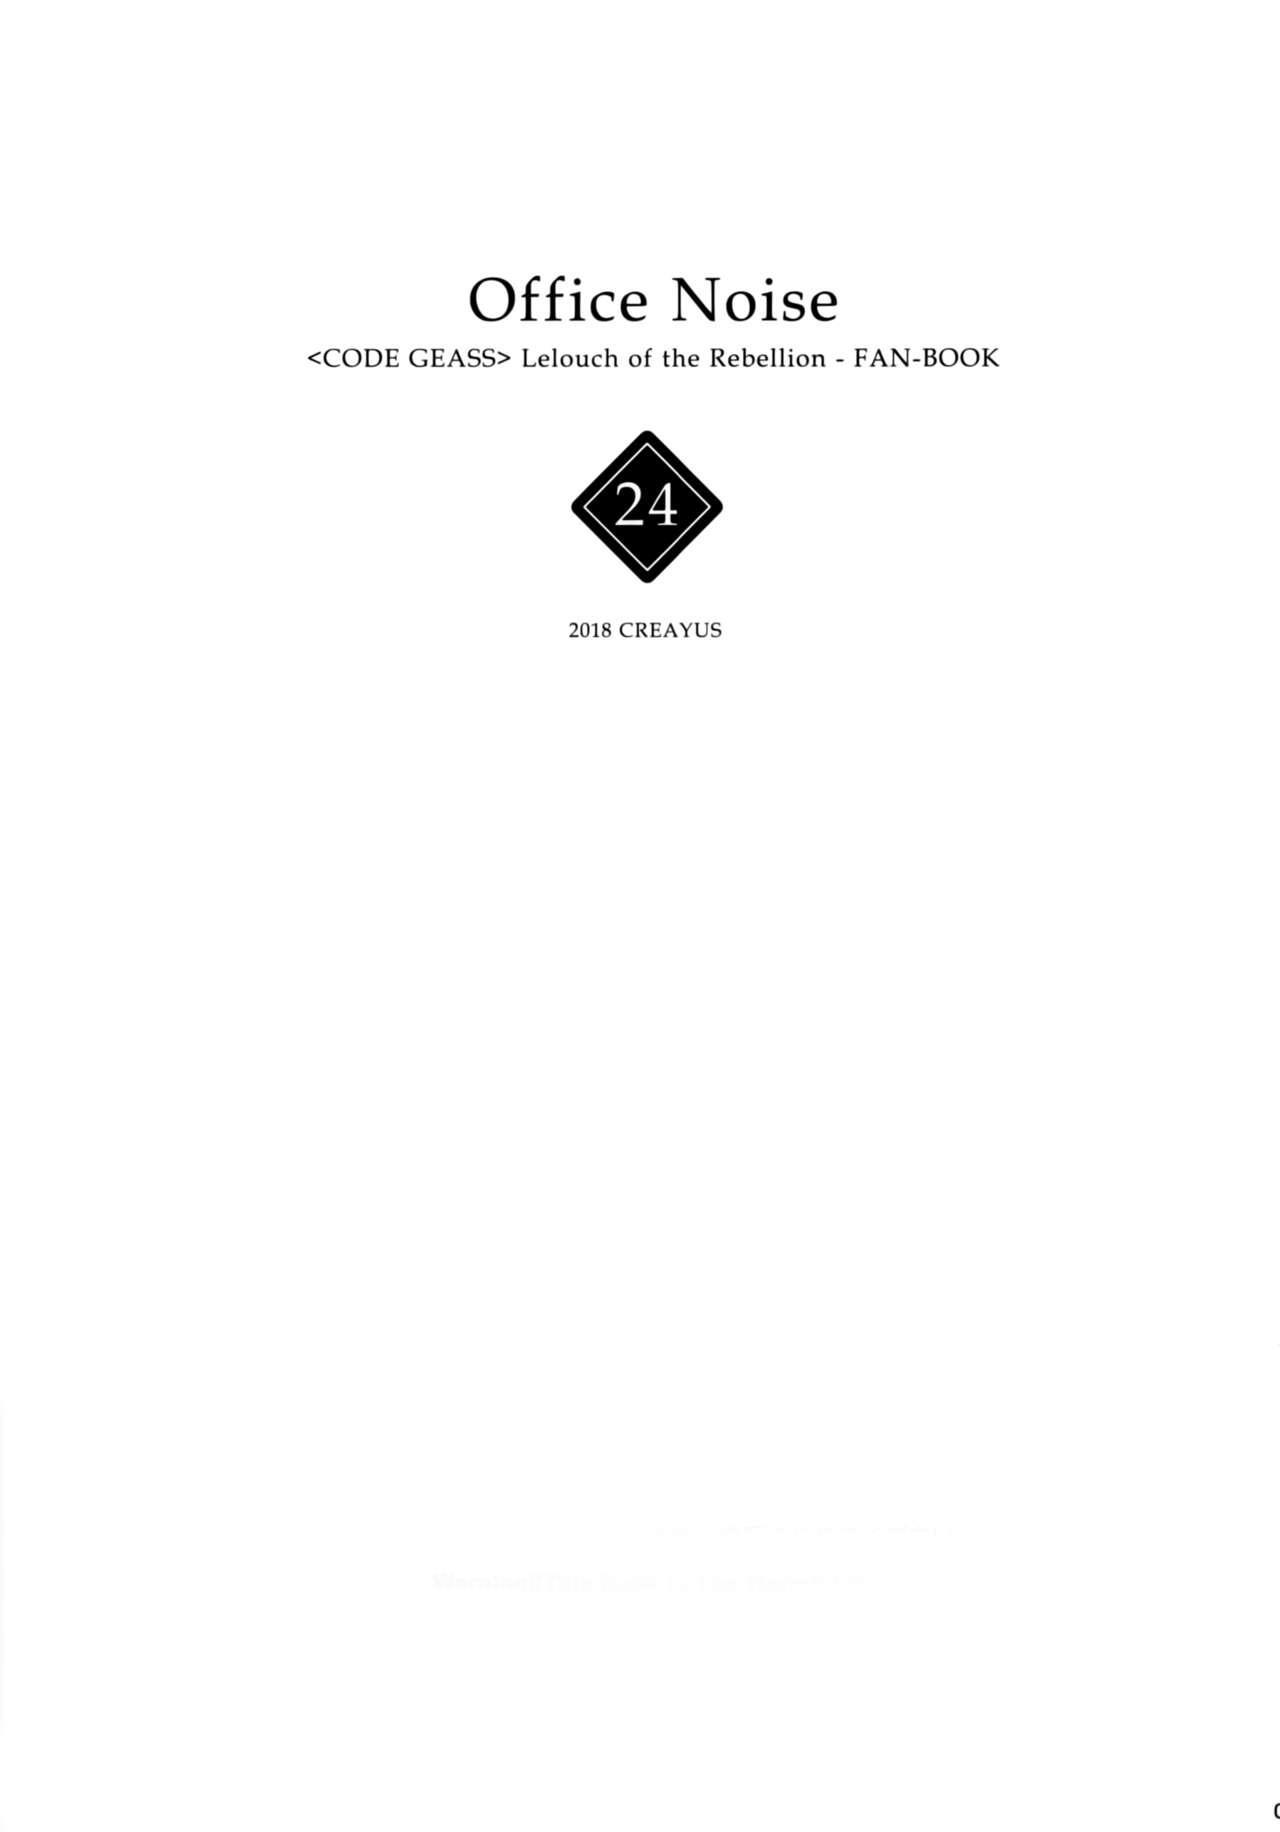 Office Noise 1